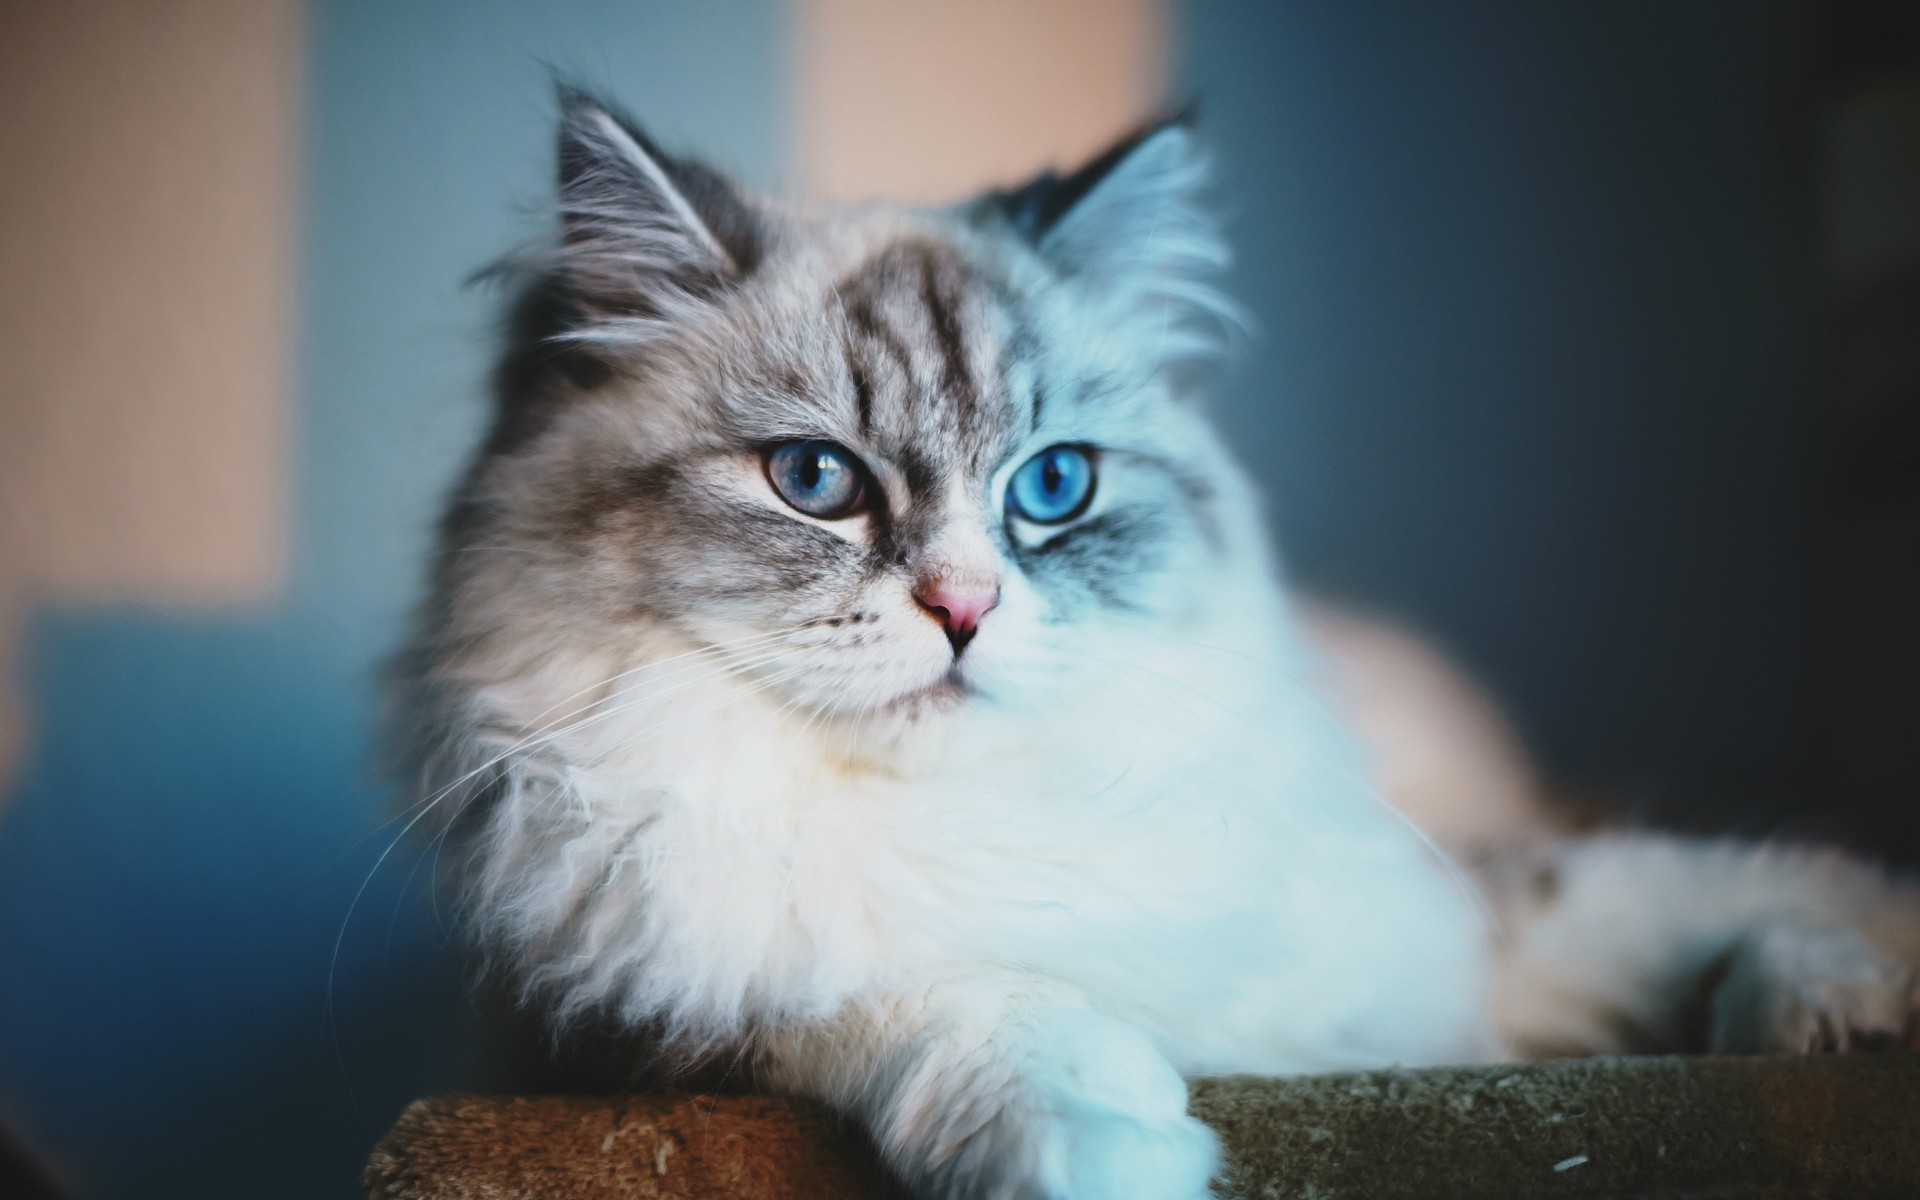 Blue Cat Meow Wallpaper Norwegian Forest Cat Blue Eyes 510896 Hd Wallpaper Backgrounds Download